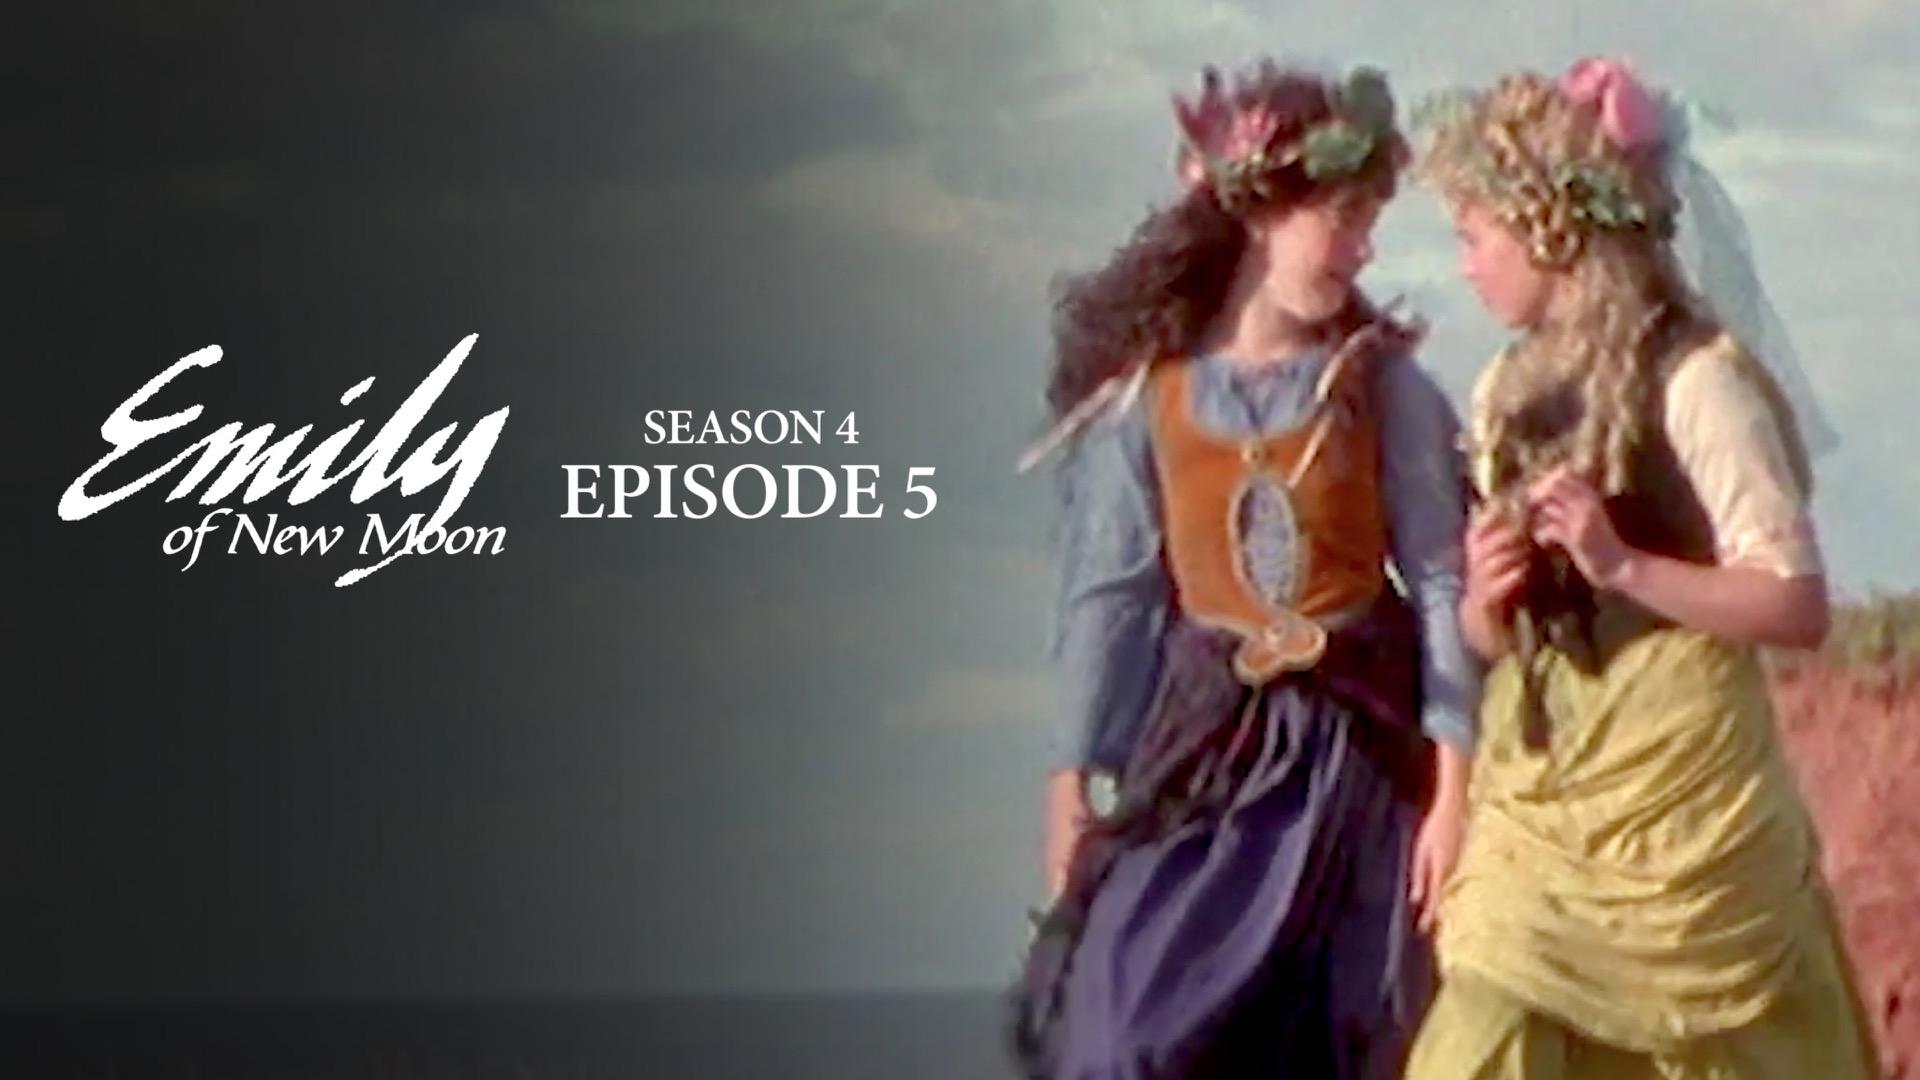 Emily of New Moon Season 4 Episode 5